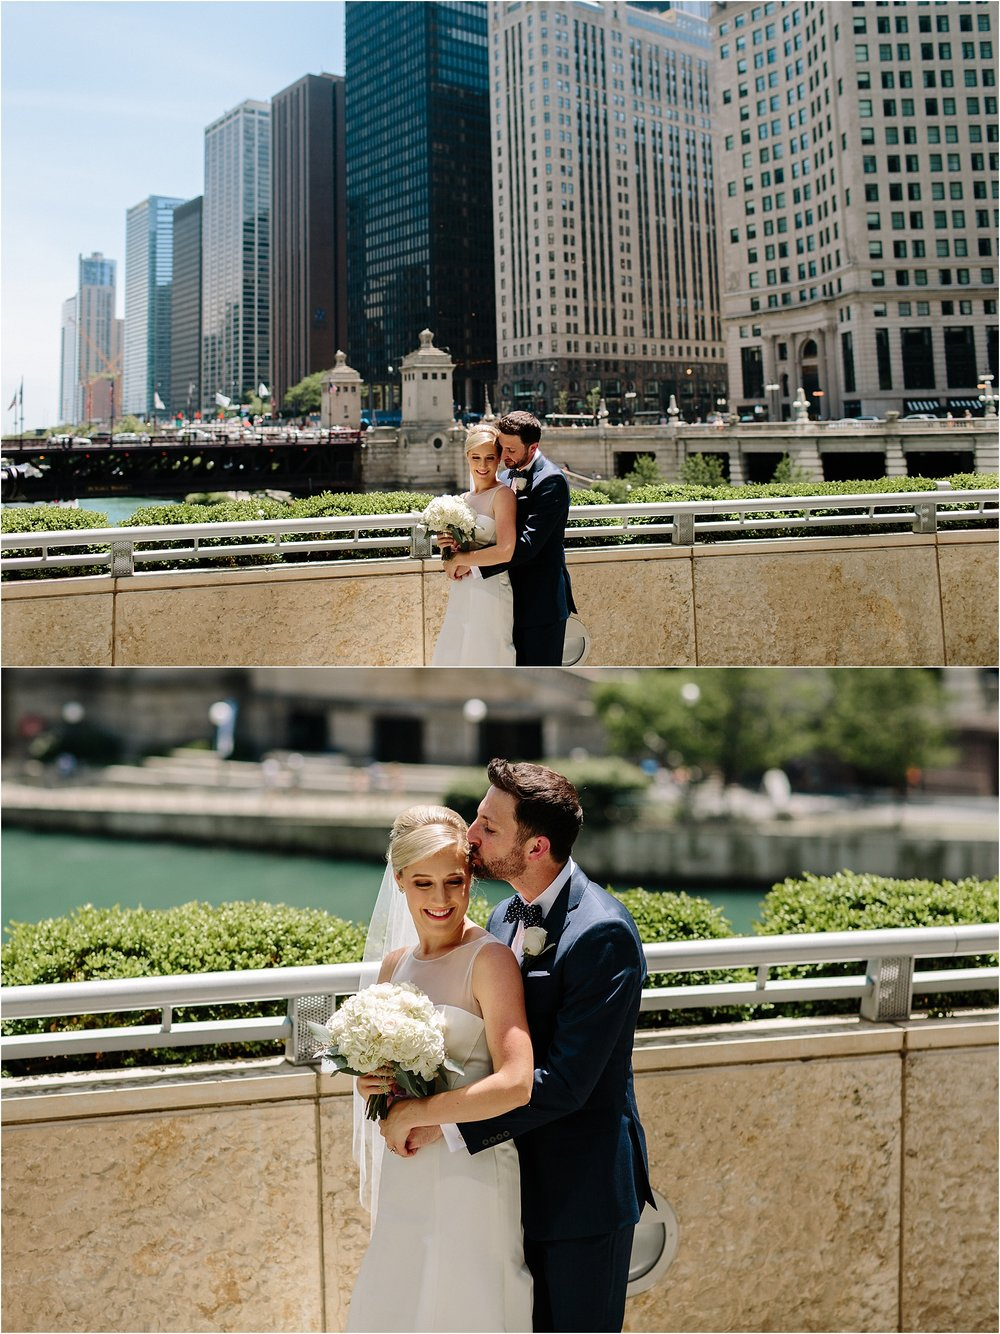 chicago-wedding-photographer-58.jpg